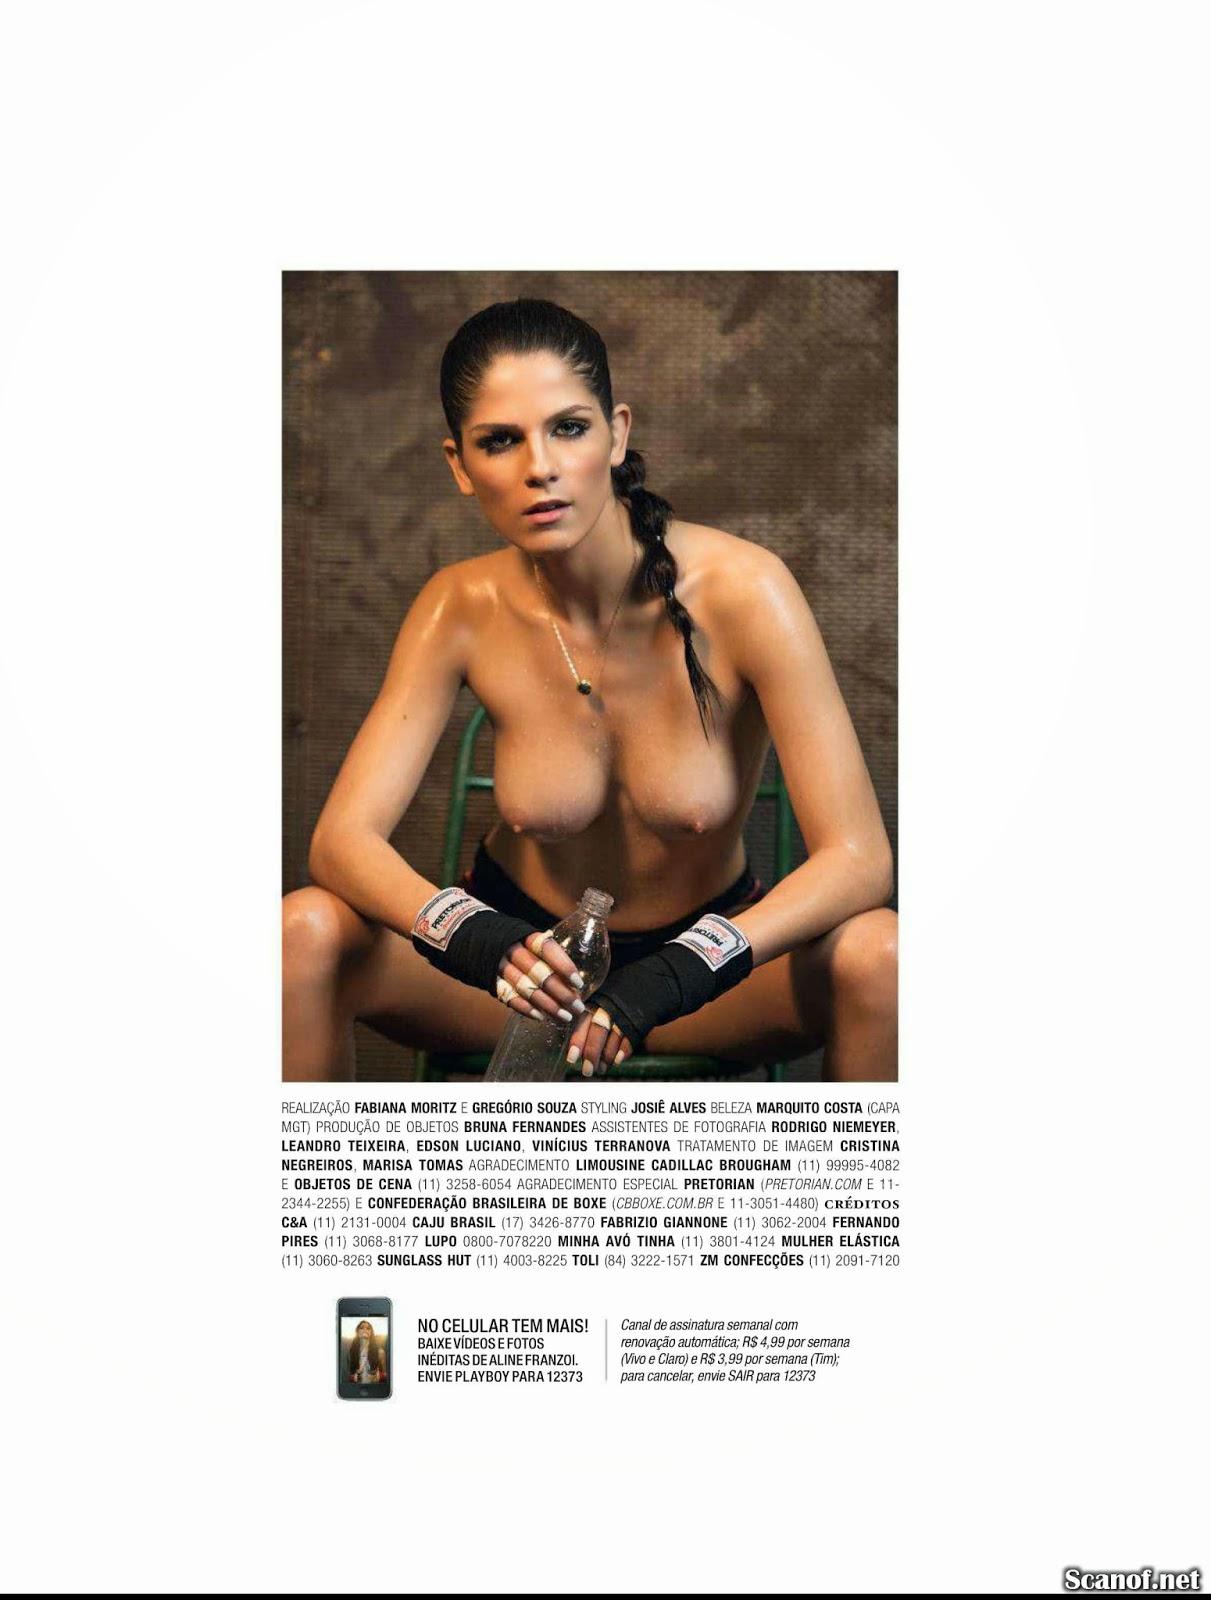 Playboy aline franzoi PLAYBOY MAGAZINE